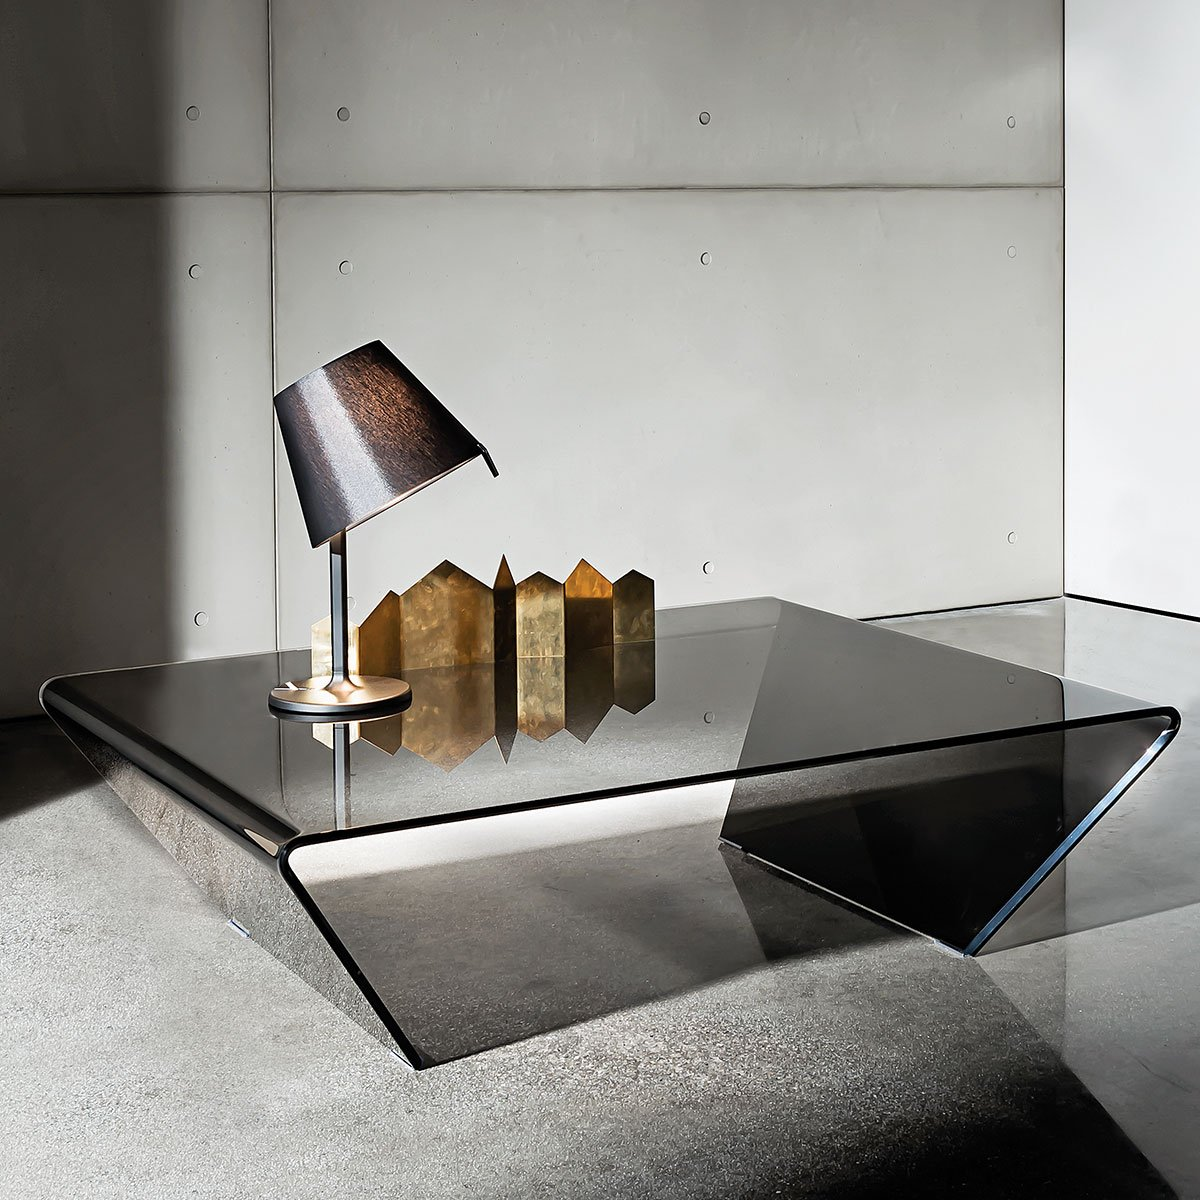 rubino curved glass coffee table klarity glass furniture. Black Bedroom Furniture Sets. Home Design Ideas